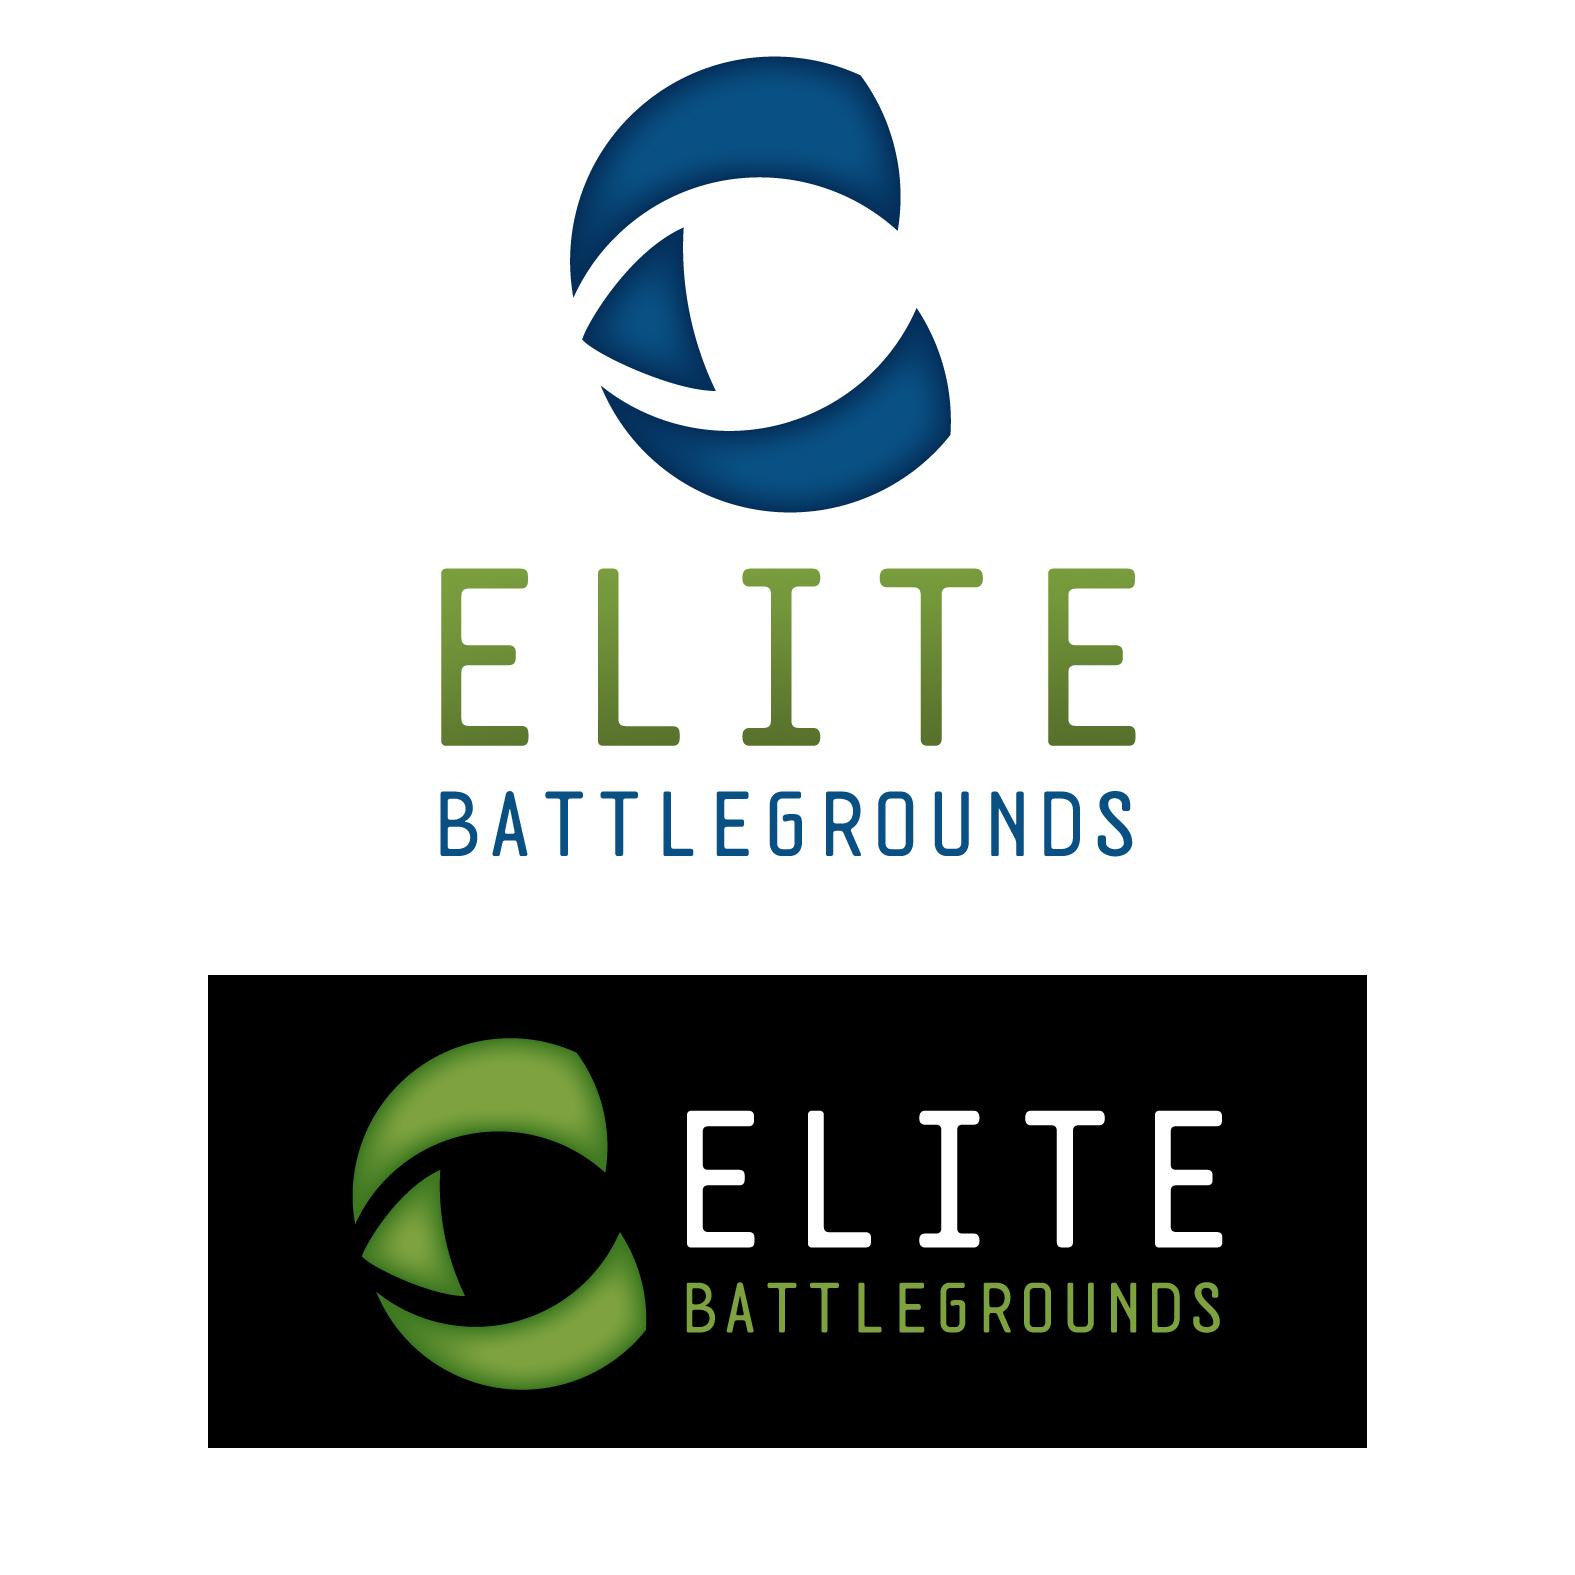 Logo Design by Sean Larkin - Entry No. 62 in the Logo Design Contest Creative Logo Design for Elite Battlegrounds.